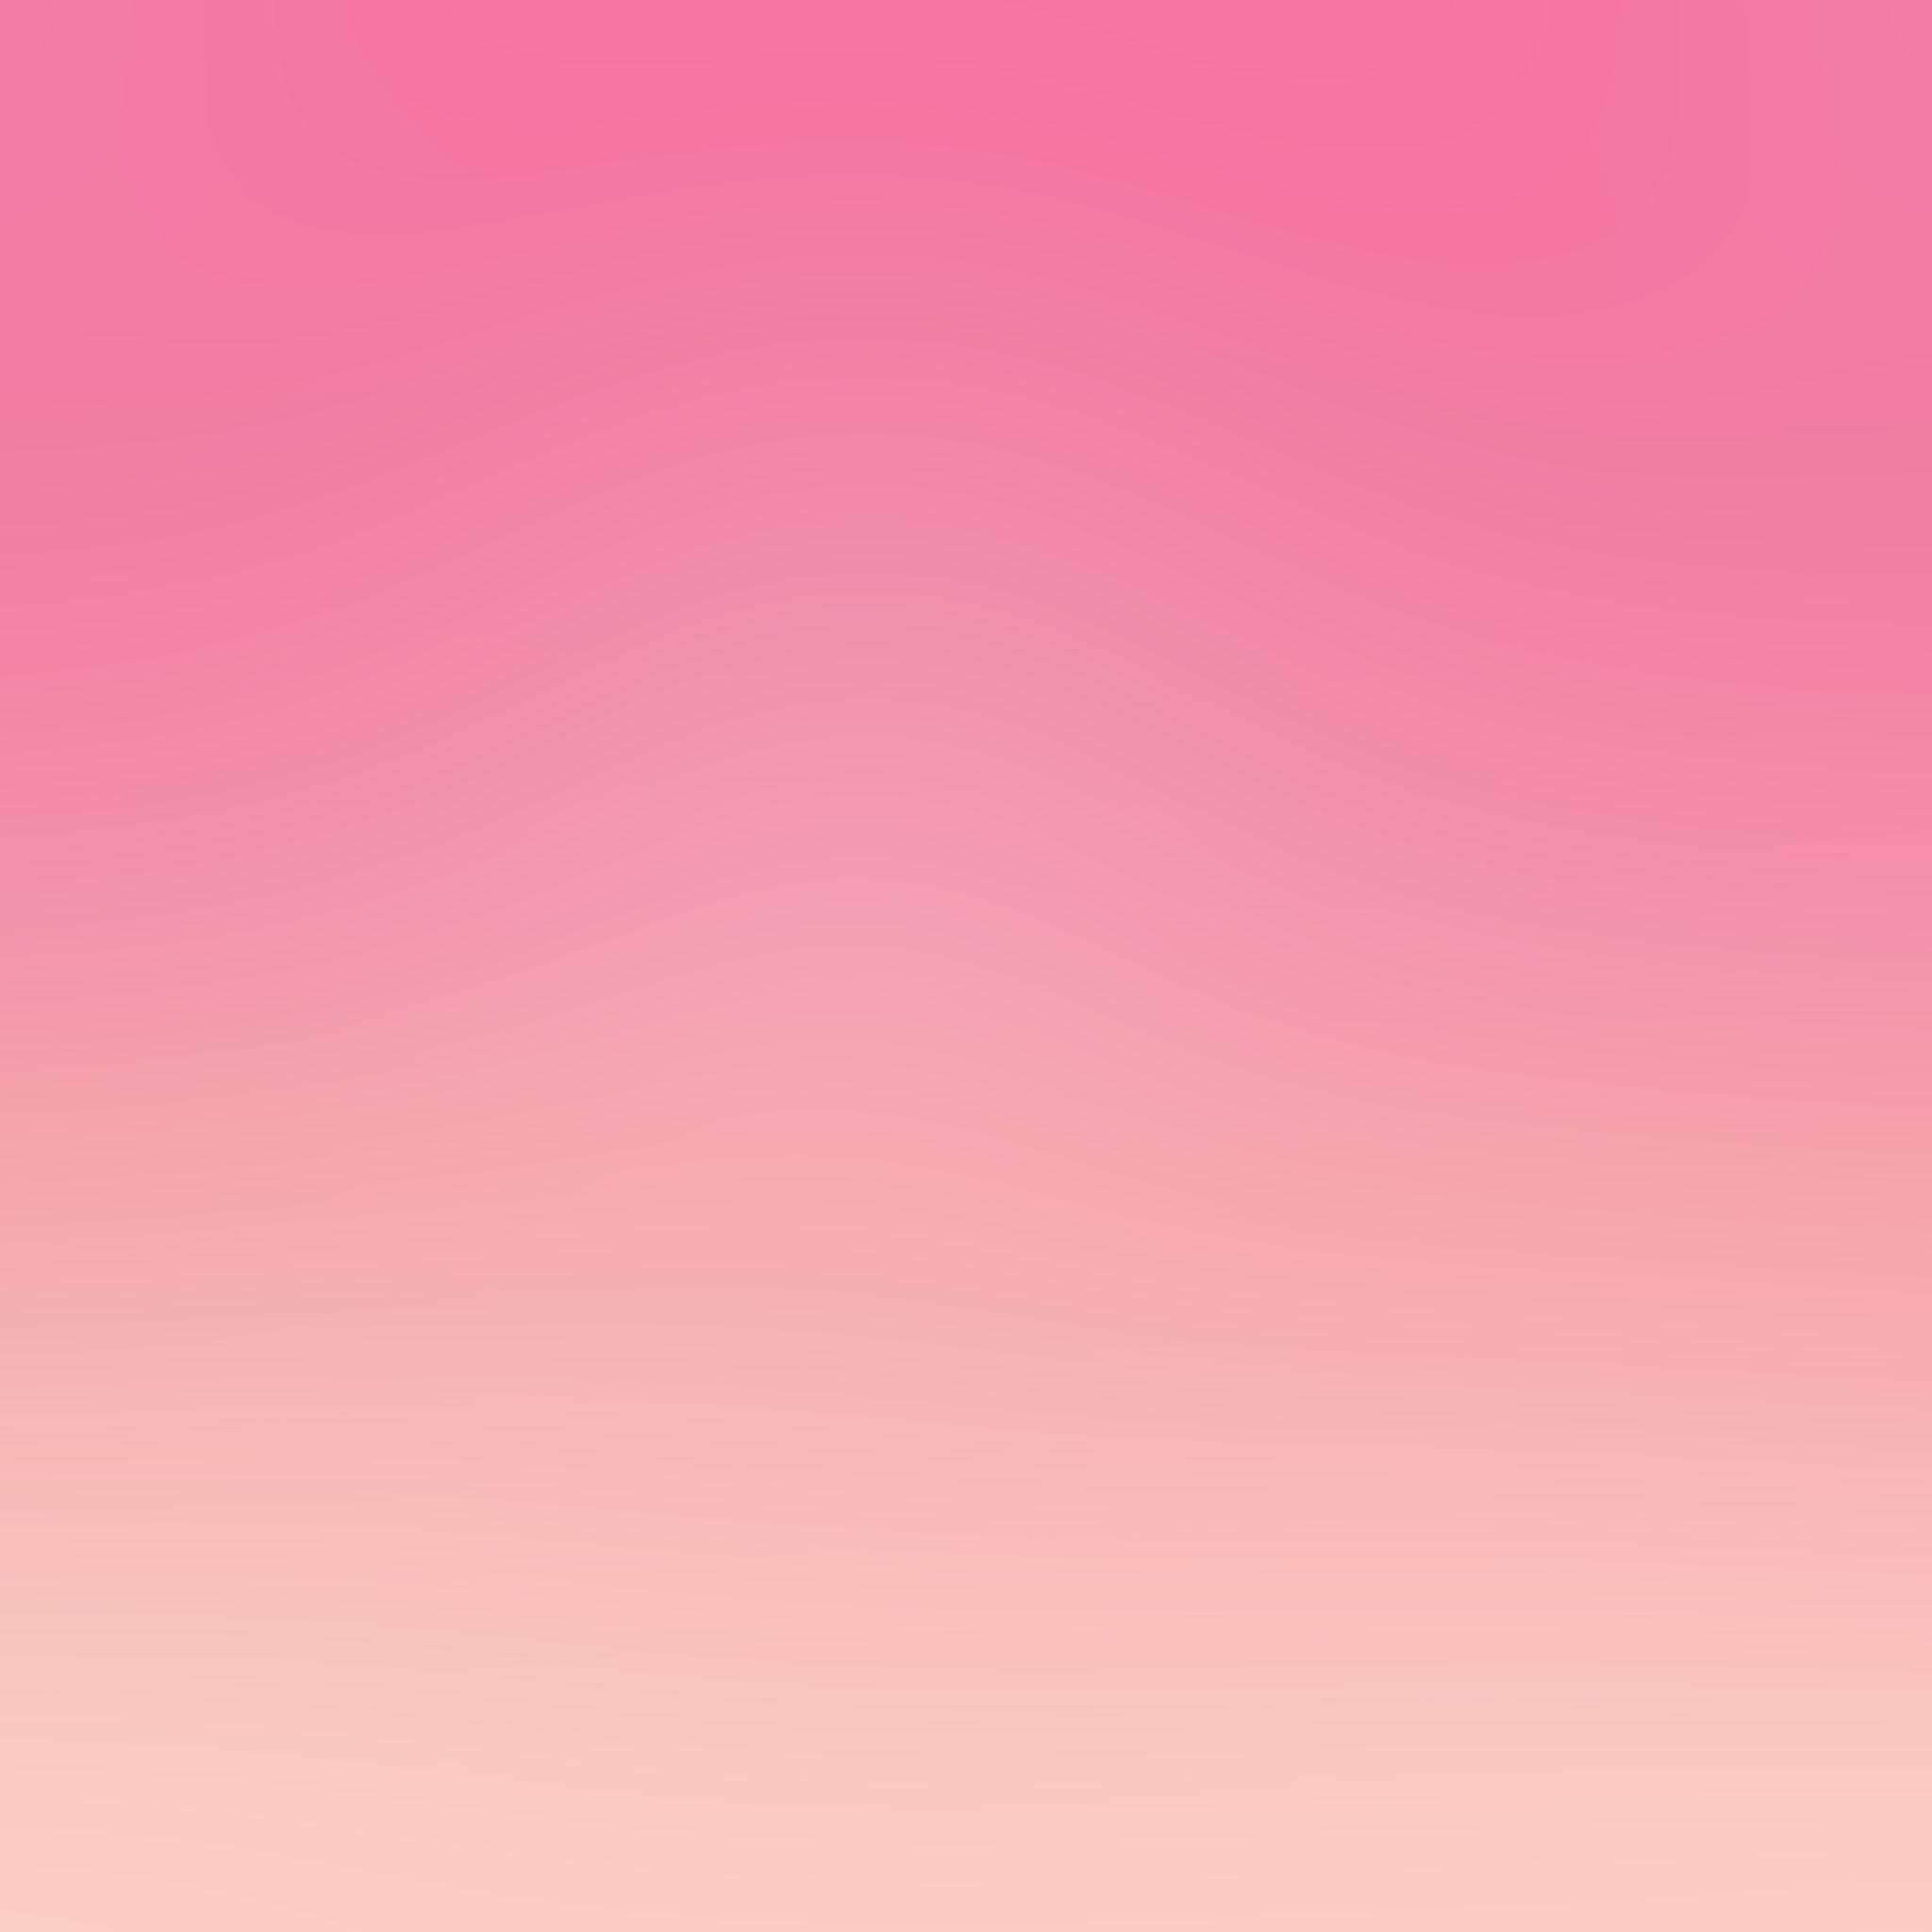 pink yellow gradation blur ipad air wallpaper download | iphone